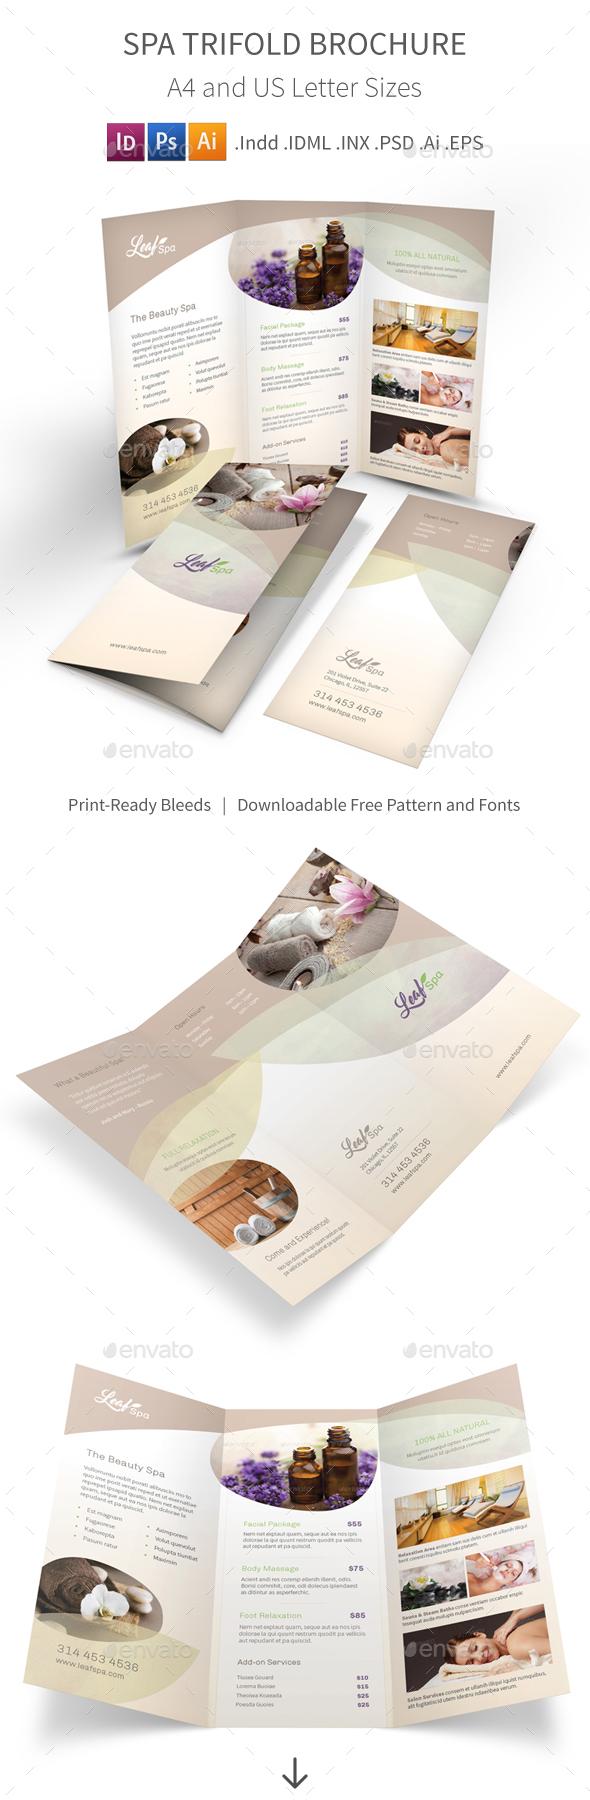 Spa Trifold Brochure 5 - Informational Brochures